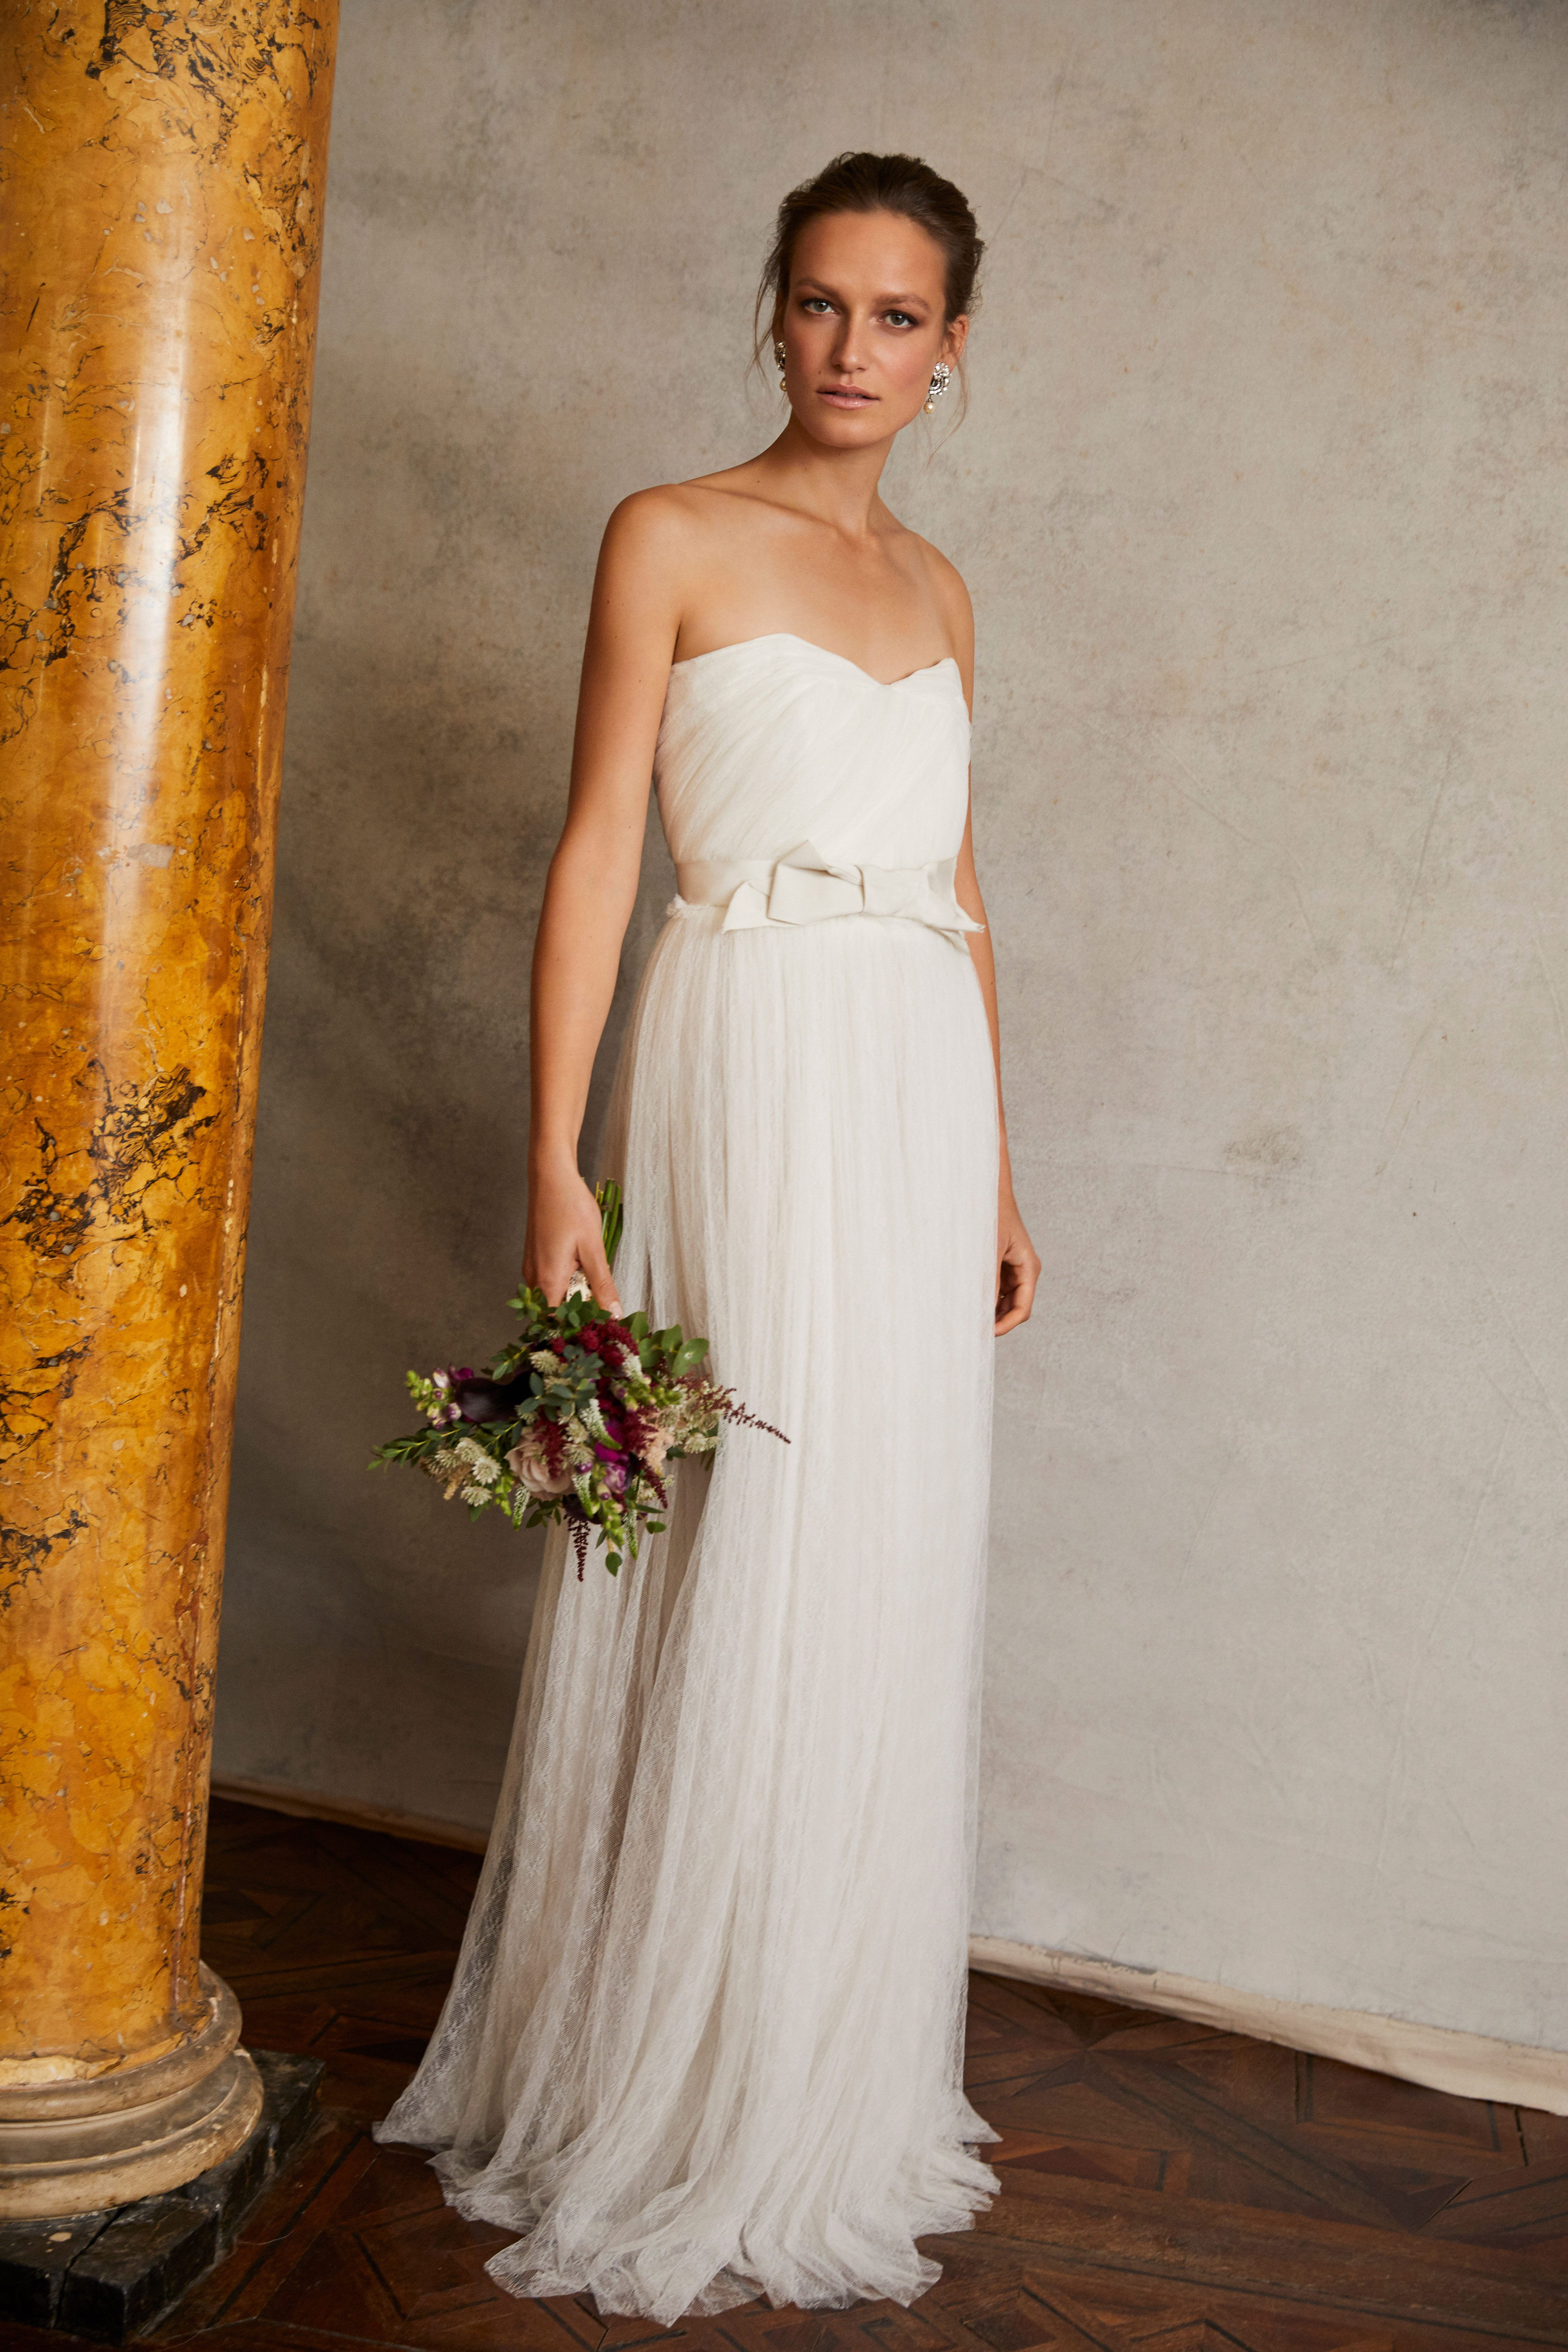 Designer Wedding Dresses Sale Up To 70 Off At THE